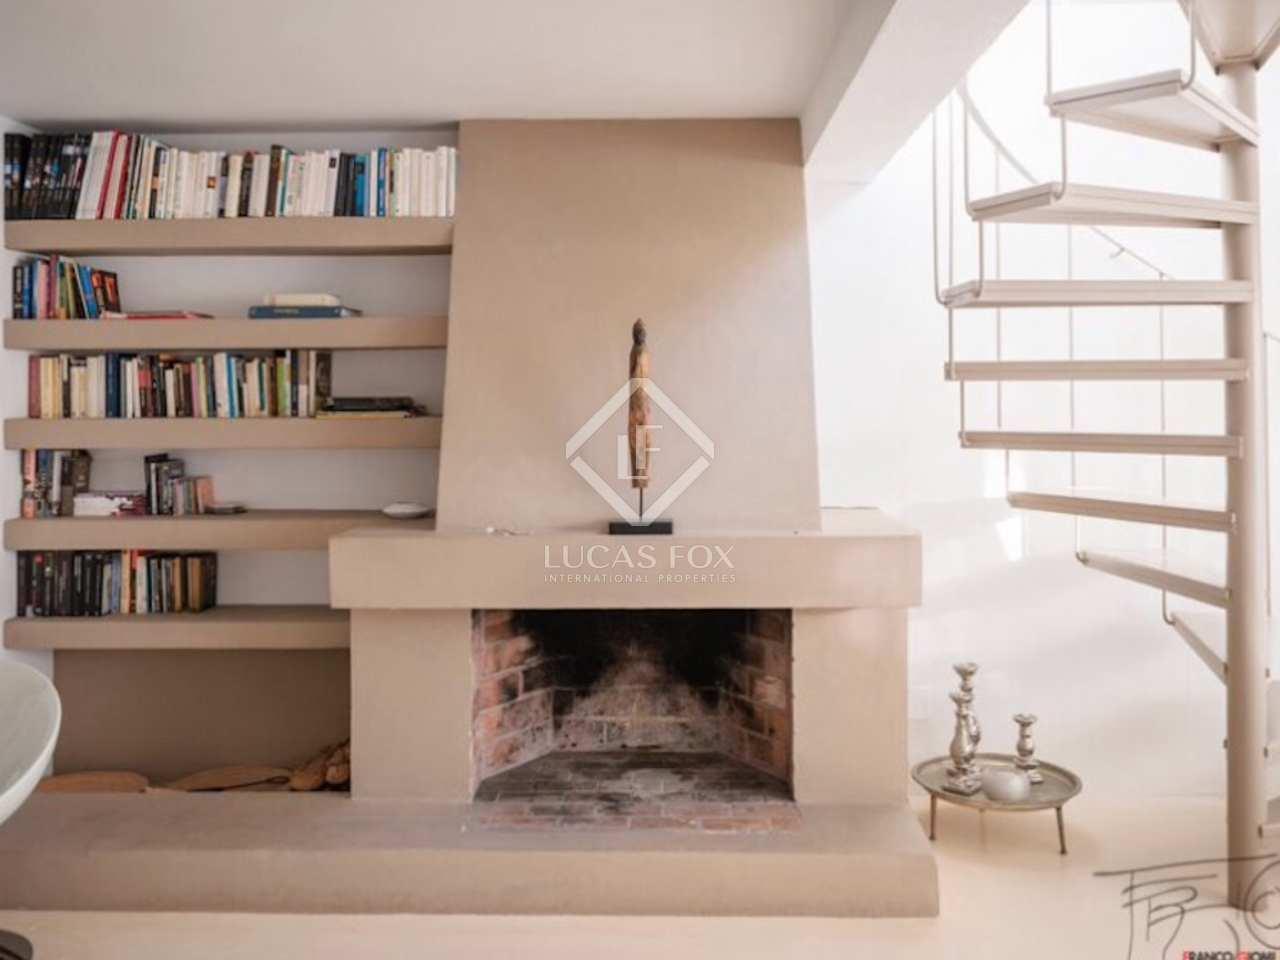 Casa adosada moderna en venta en roca llisa ibiza - Chimeneas santaeulalia ...